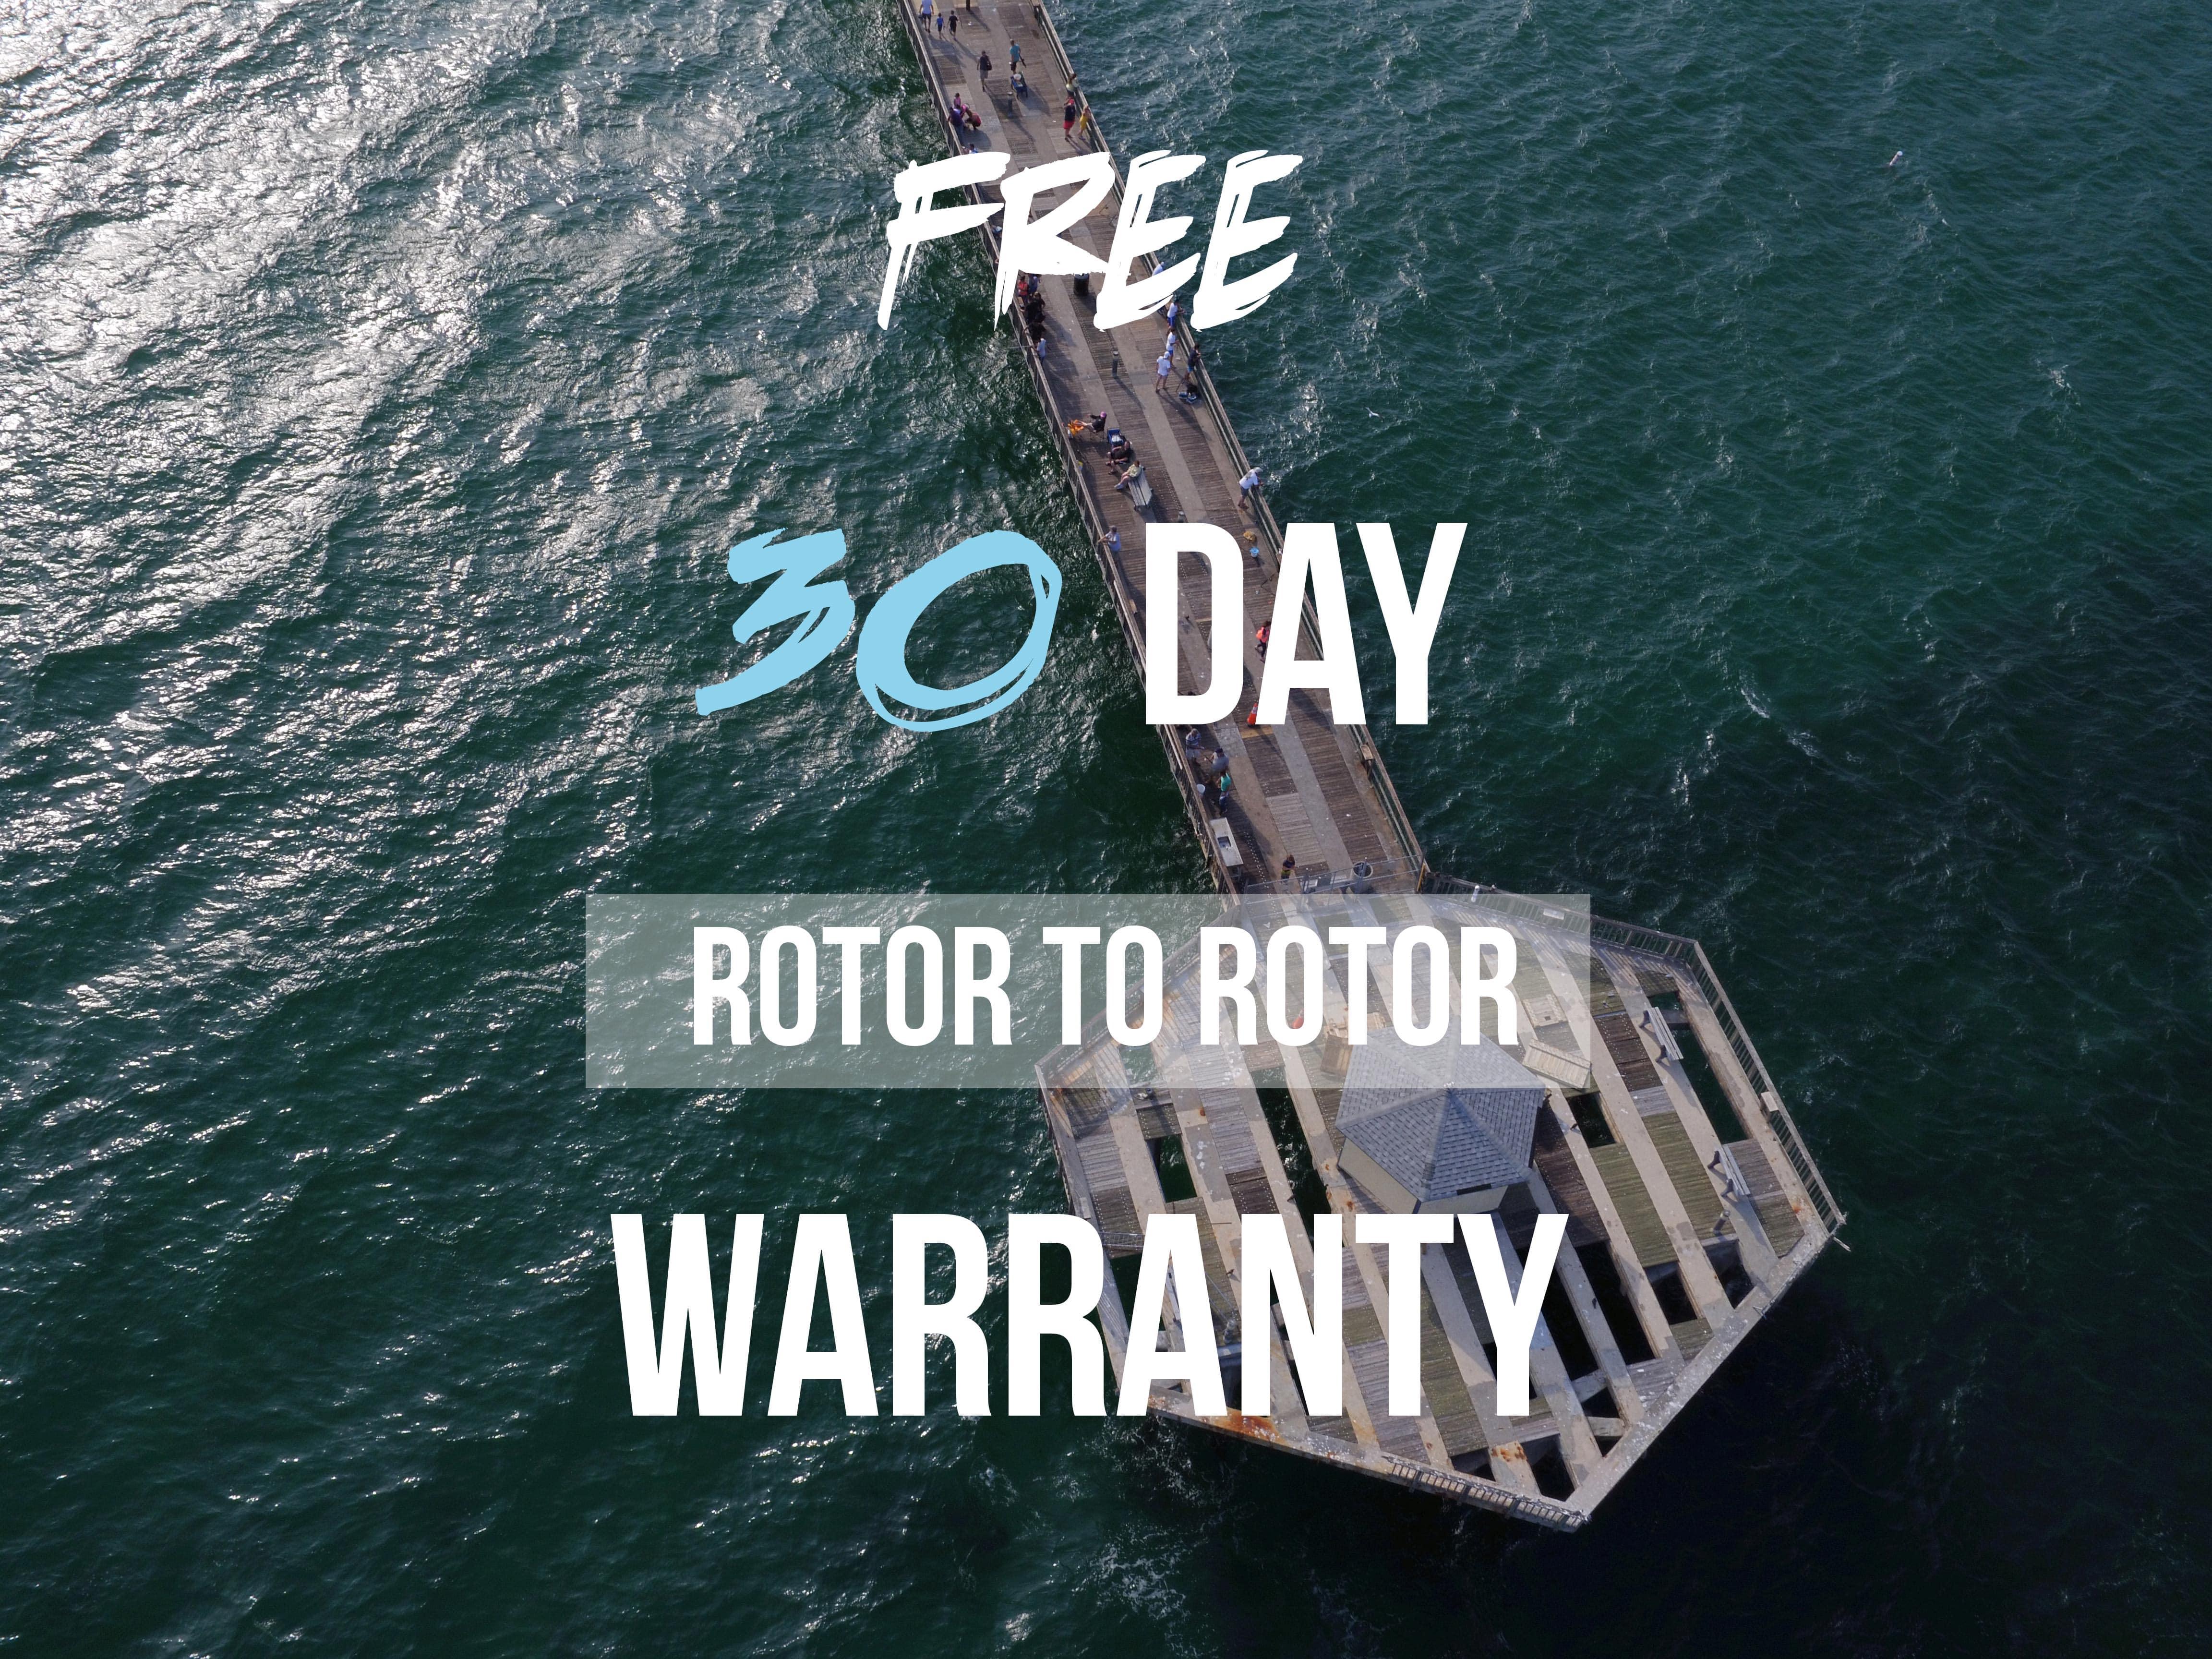 Rotor-to-rotor-warranty-free-30-days-advantages